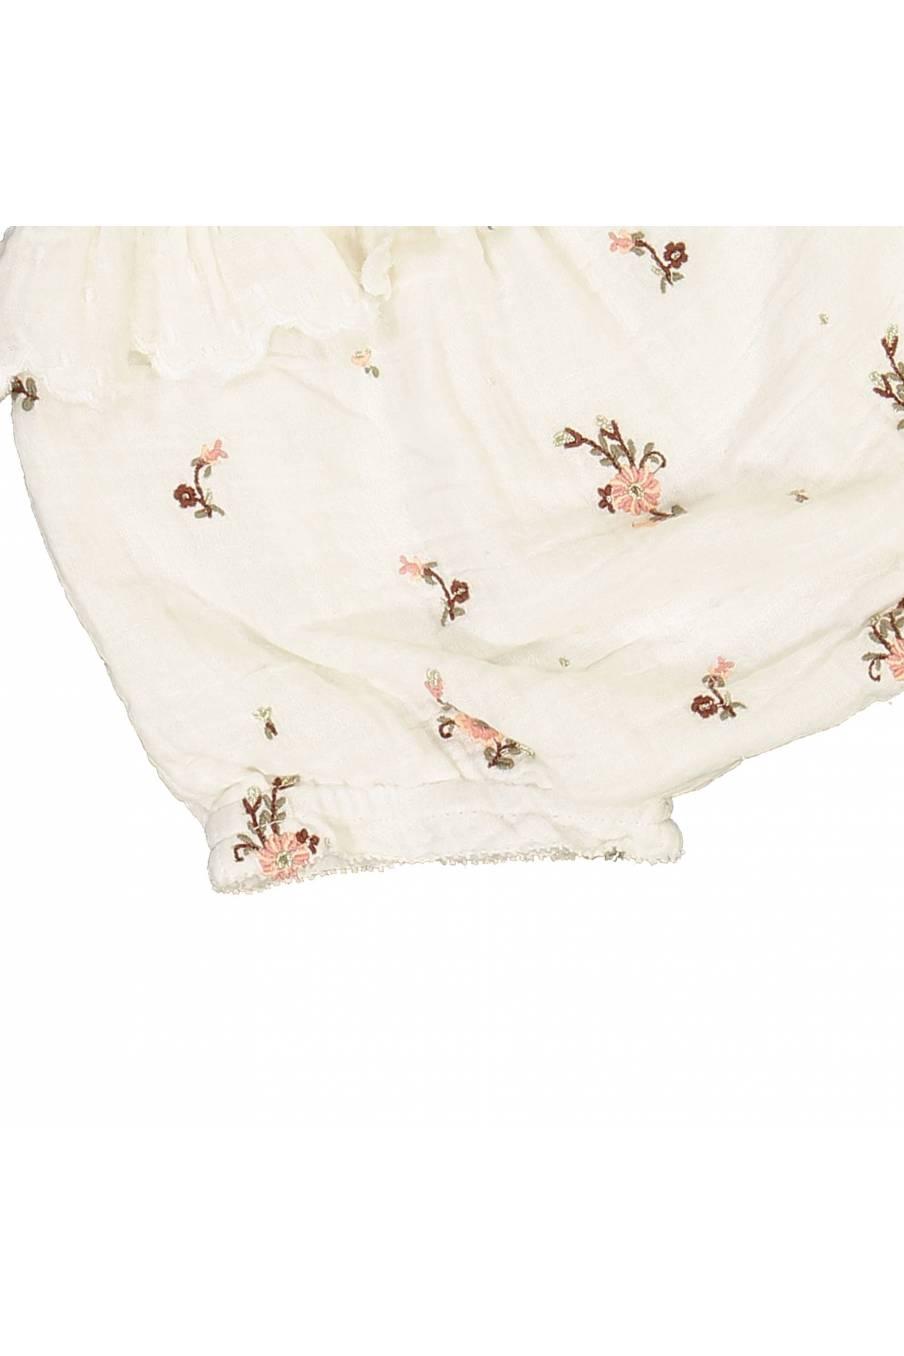 boheme chic vintage bloomer bébé fille janelle off-white flowers